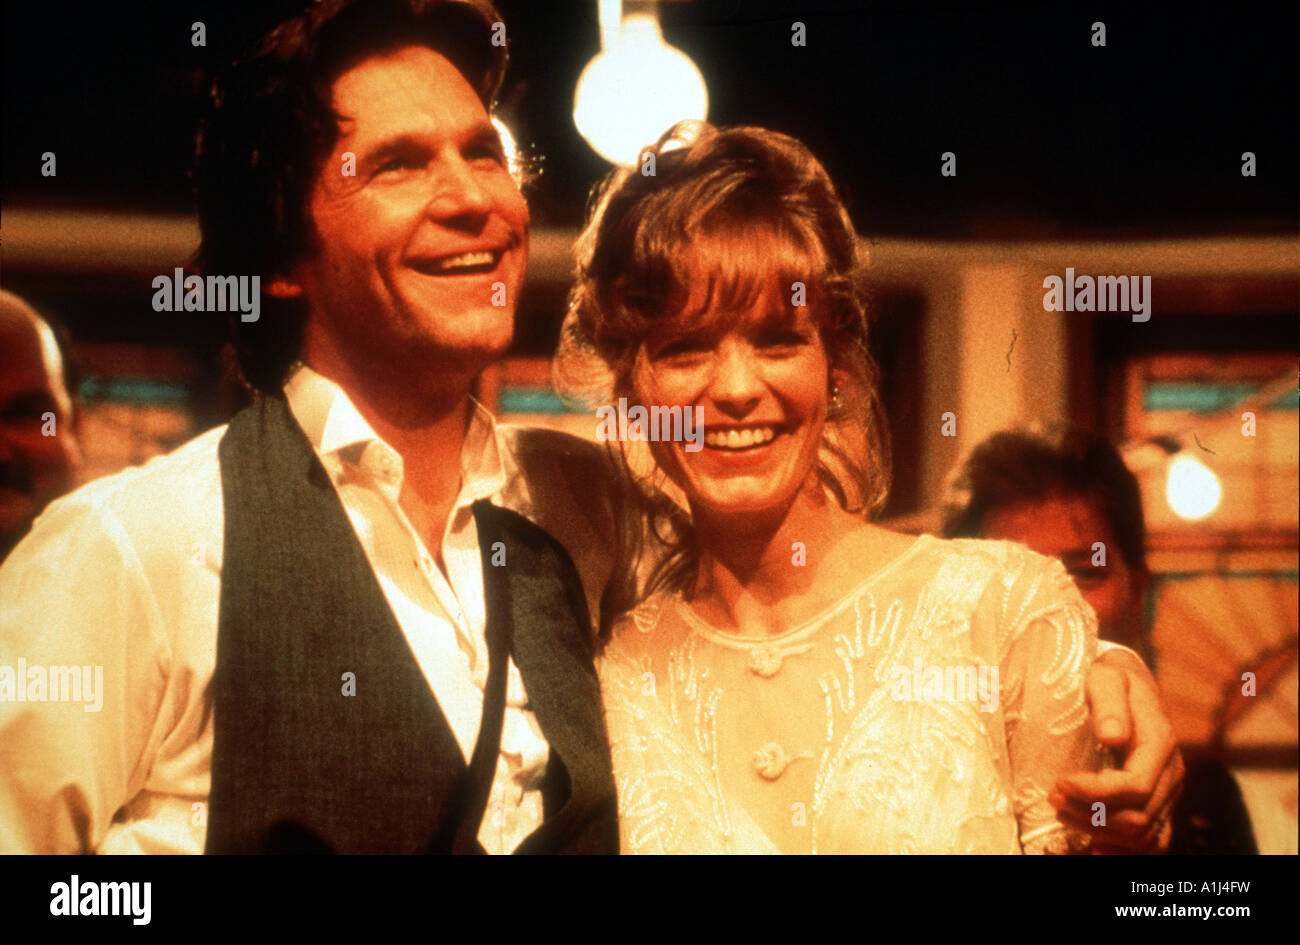 Blown Away Year 1994 Director Stephen Hopkins Jeff Bridges Suzy Amis Stock Photo